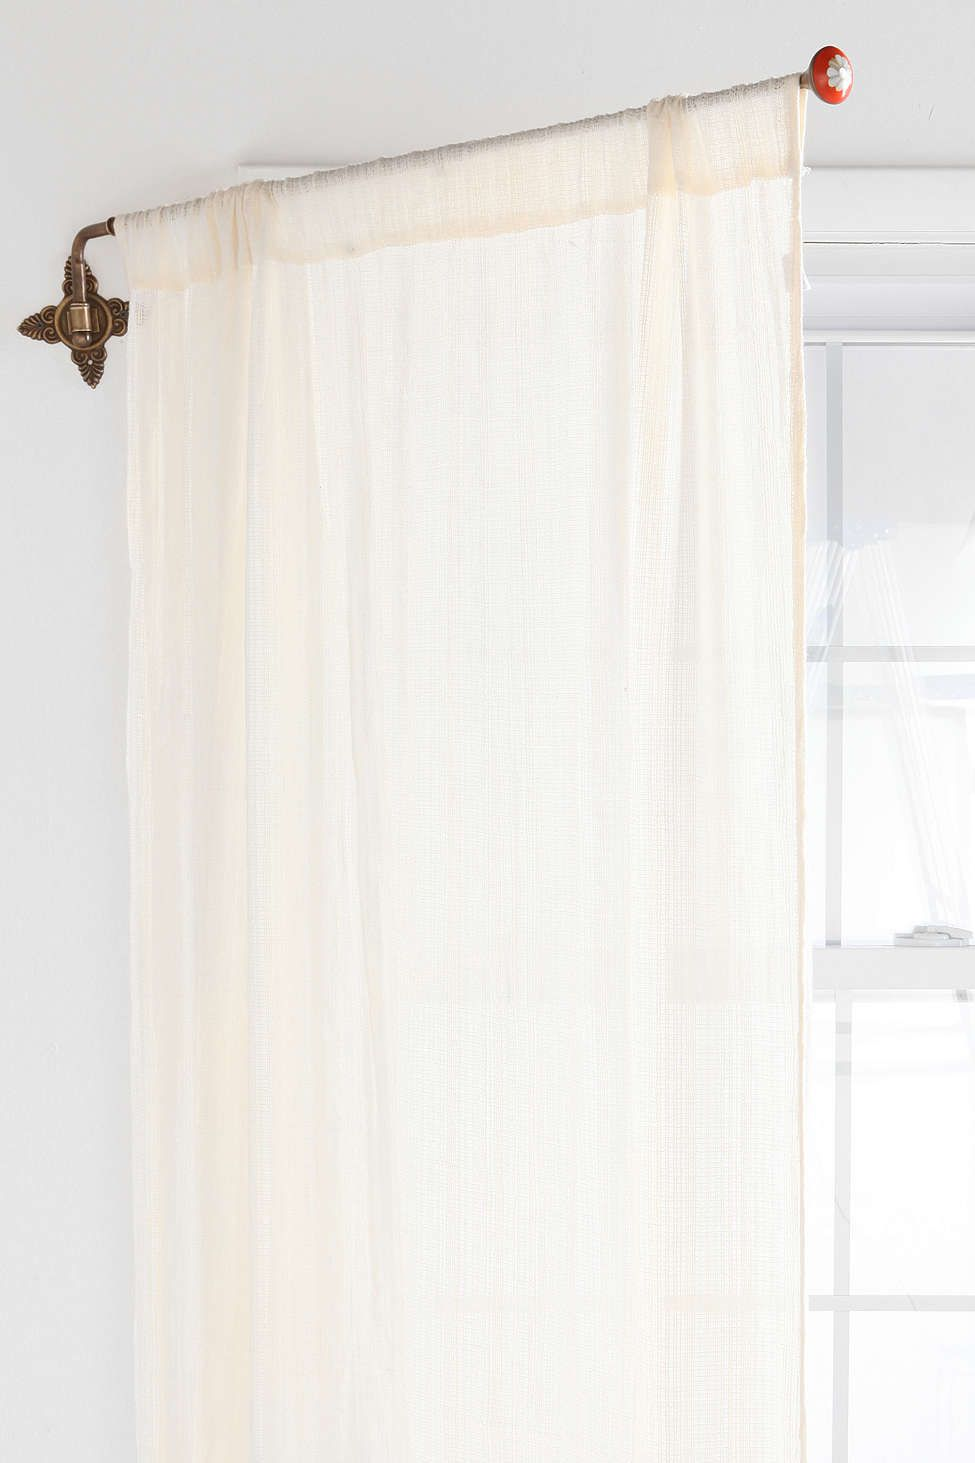 Brass Crisscross Swing Curtain Rod Curtain Rods Curtains Modern Curtains